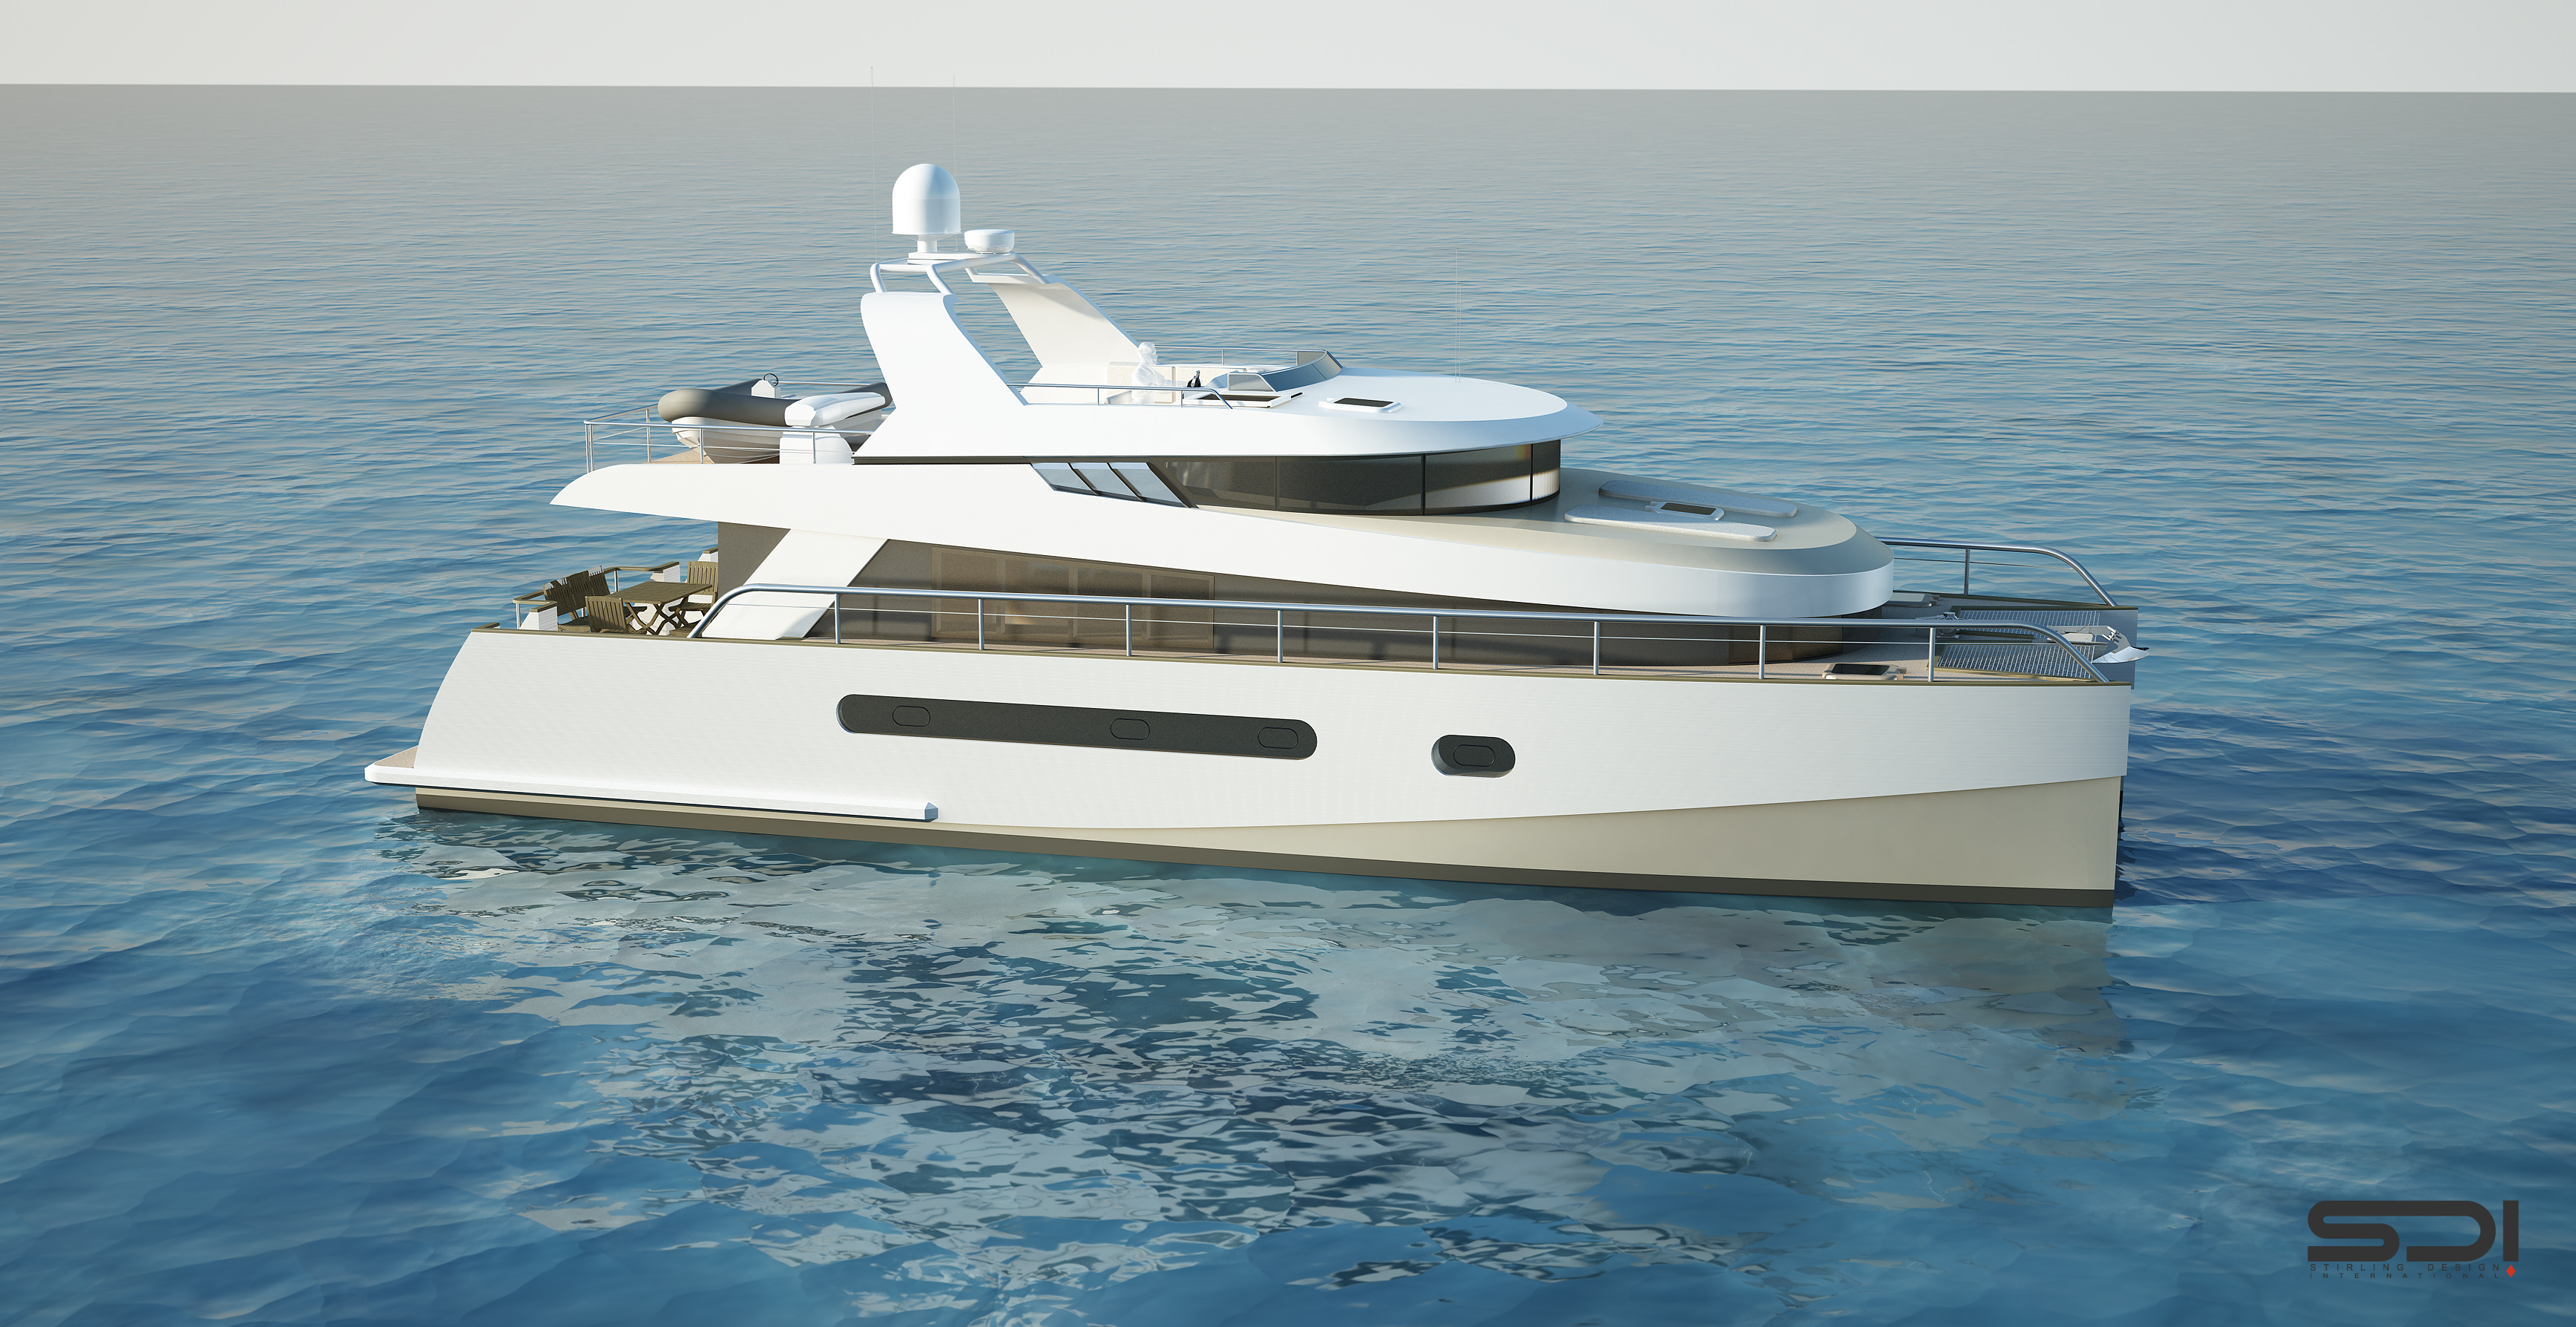 The new 65' trawler catamaran by Alu Marine shipyard and